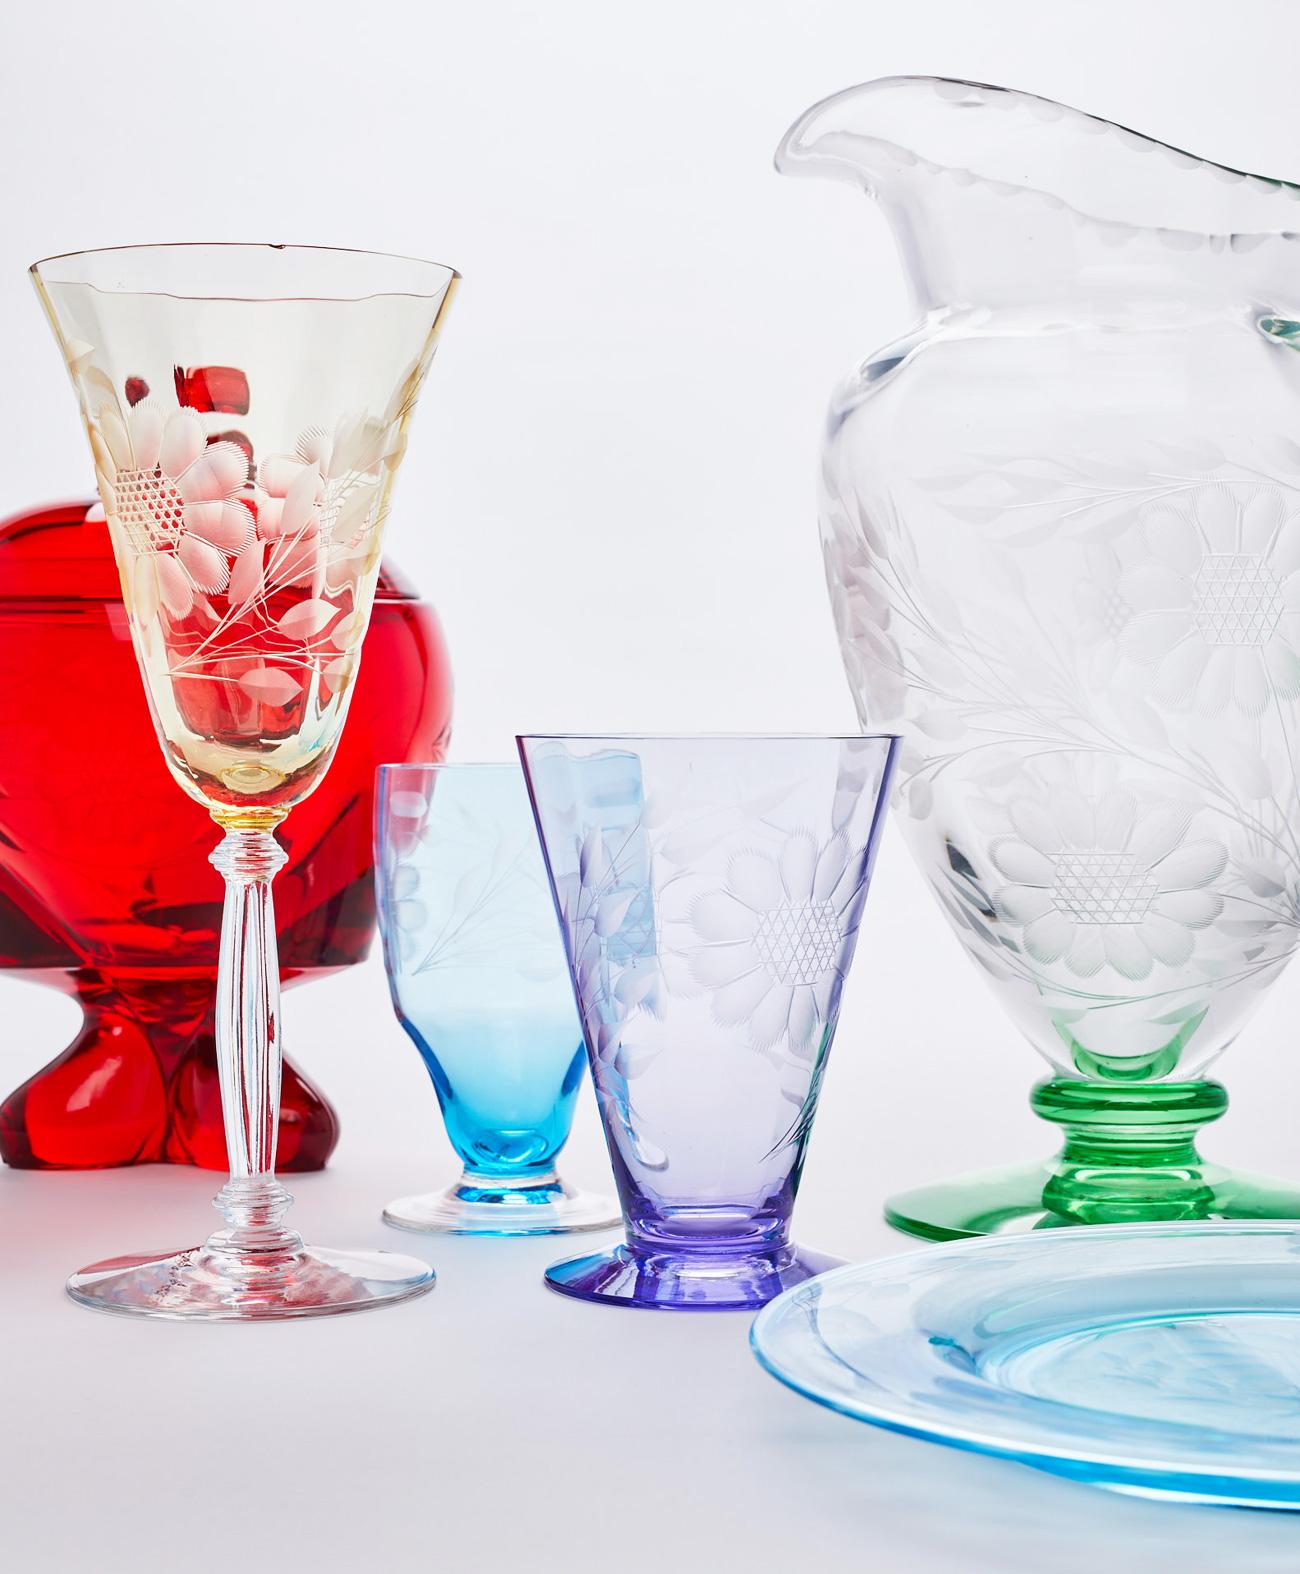 corn-flower-glass-winter2018-designlines-magazine-03.jpg